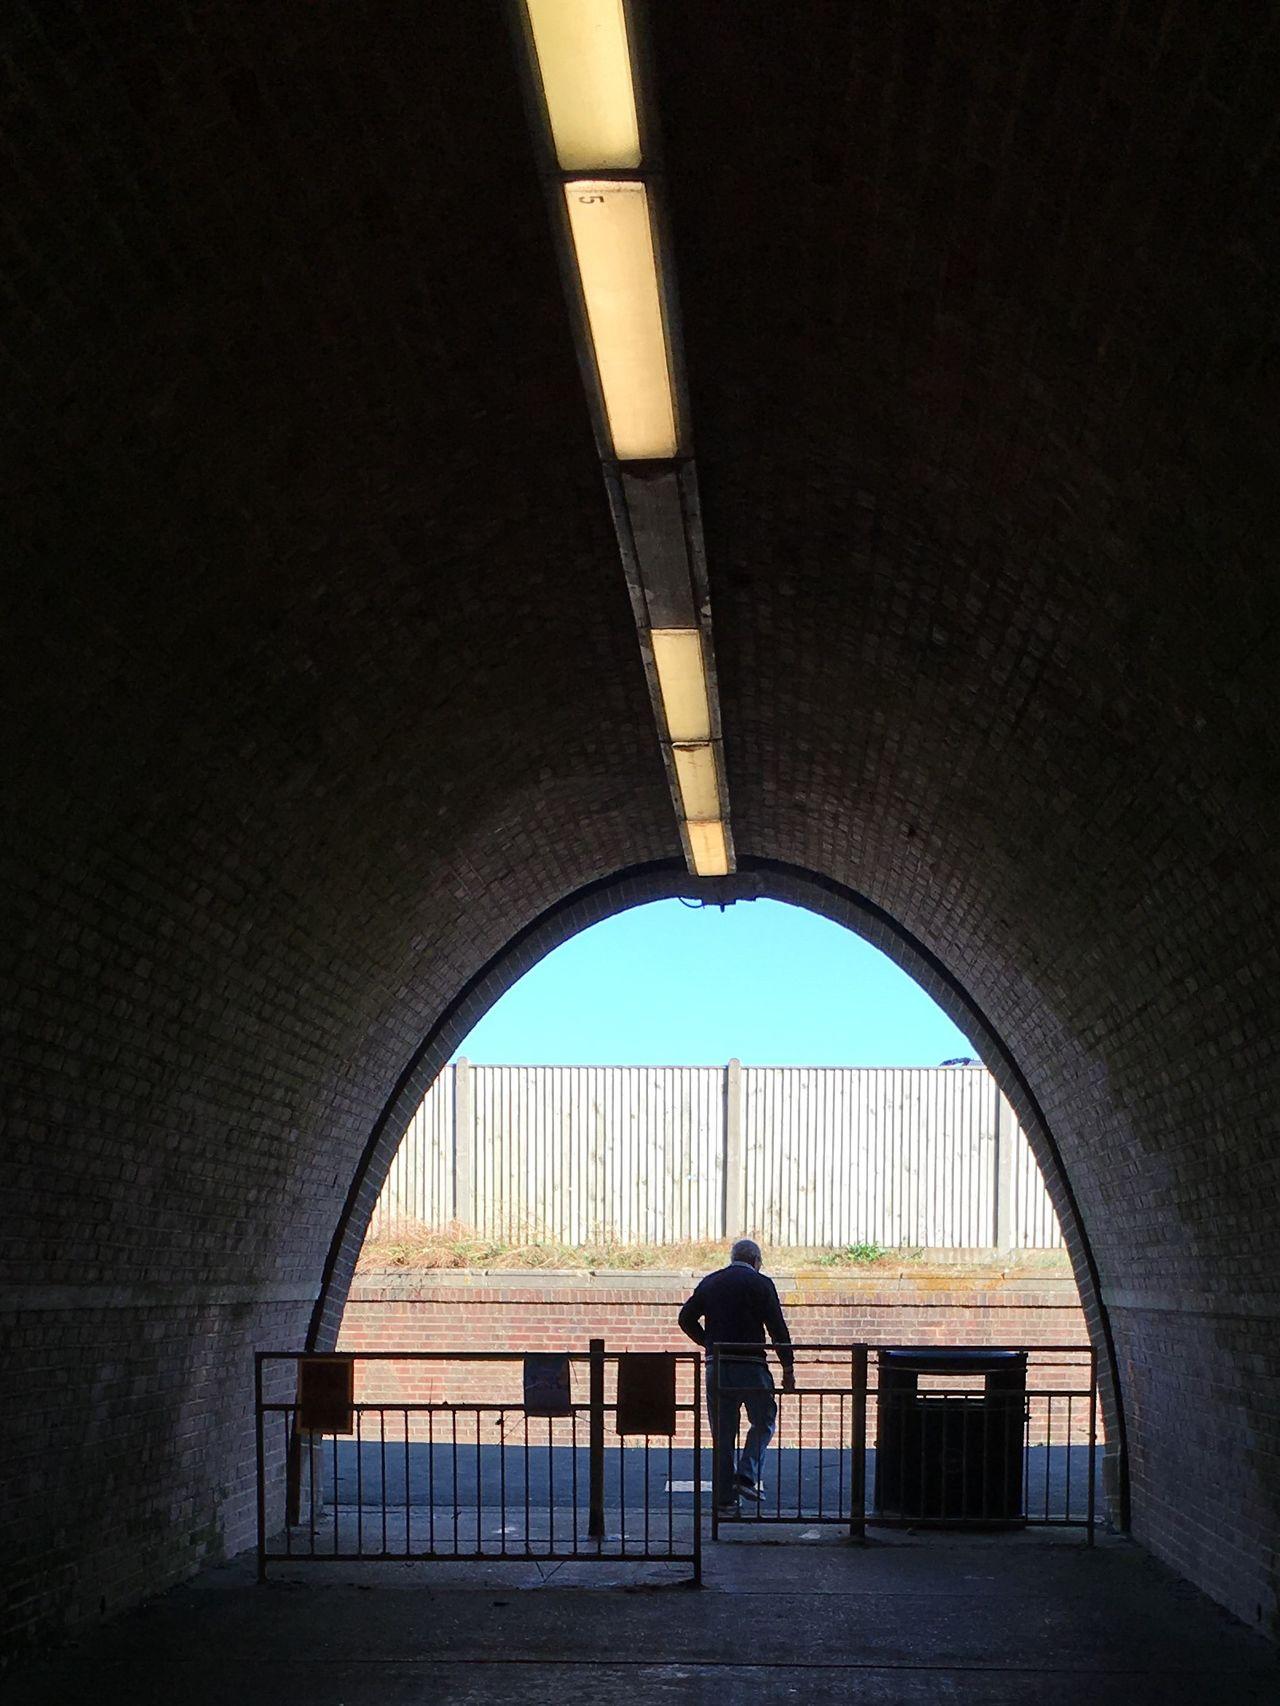 Man Leaves Tunnel Architecture Bridge - Man Made Structure Built Structure One Man Only Tunnel